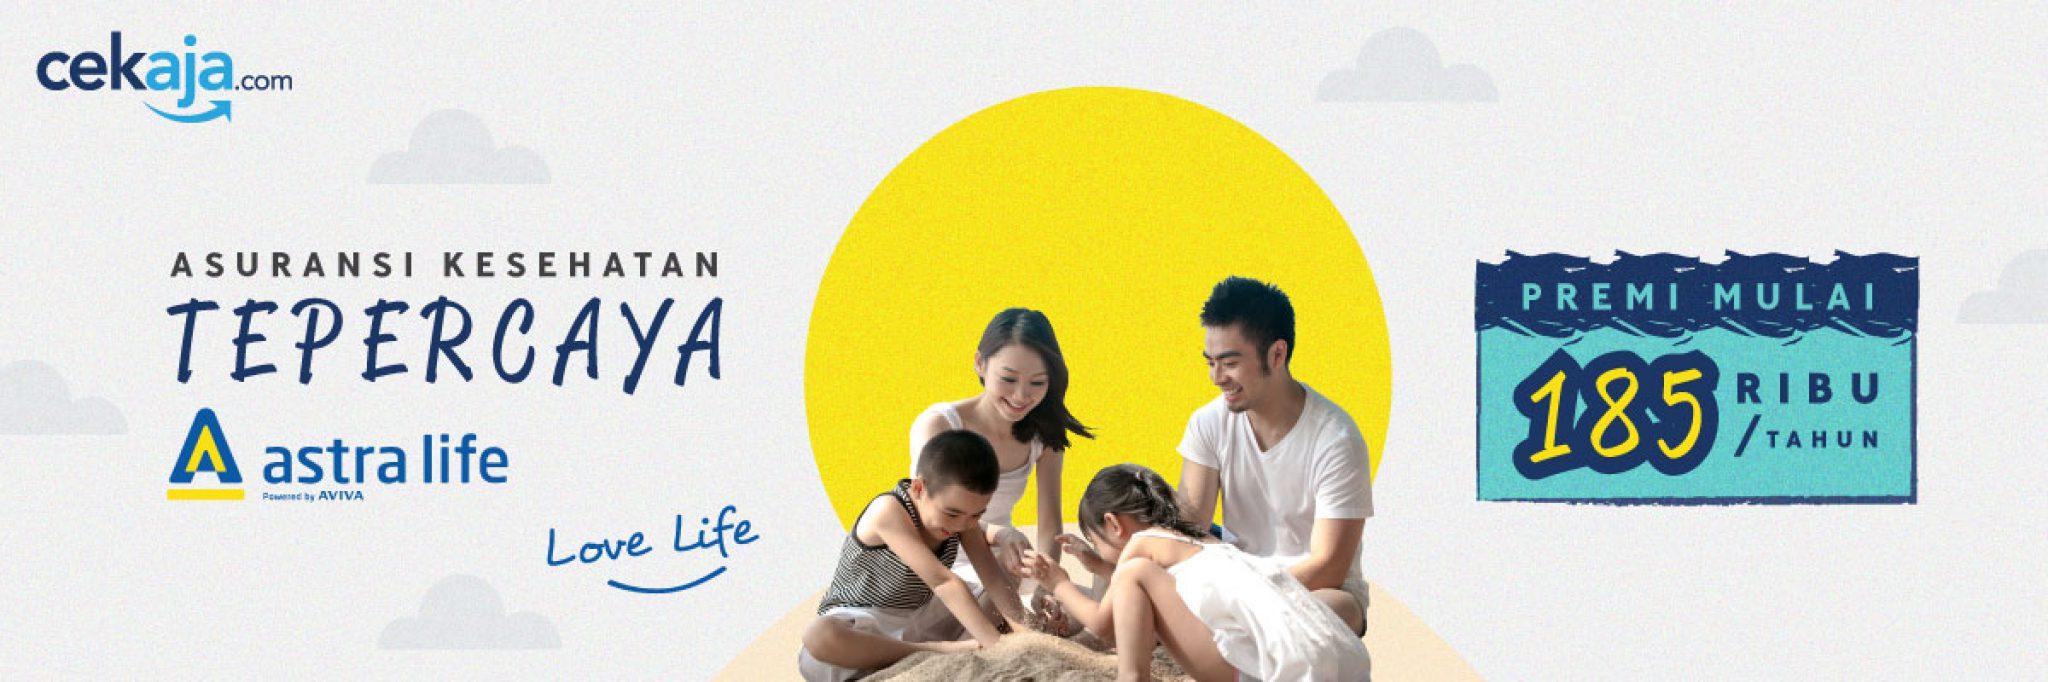 Asuransi-Kesehatan-Astra-Aviva-Cek-Aja